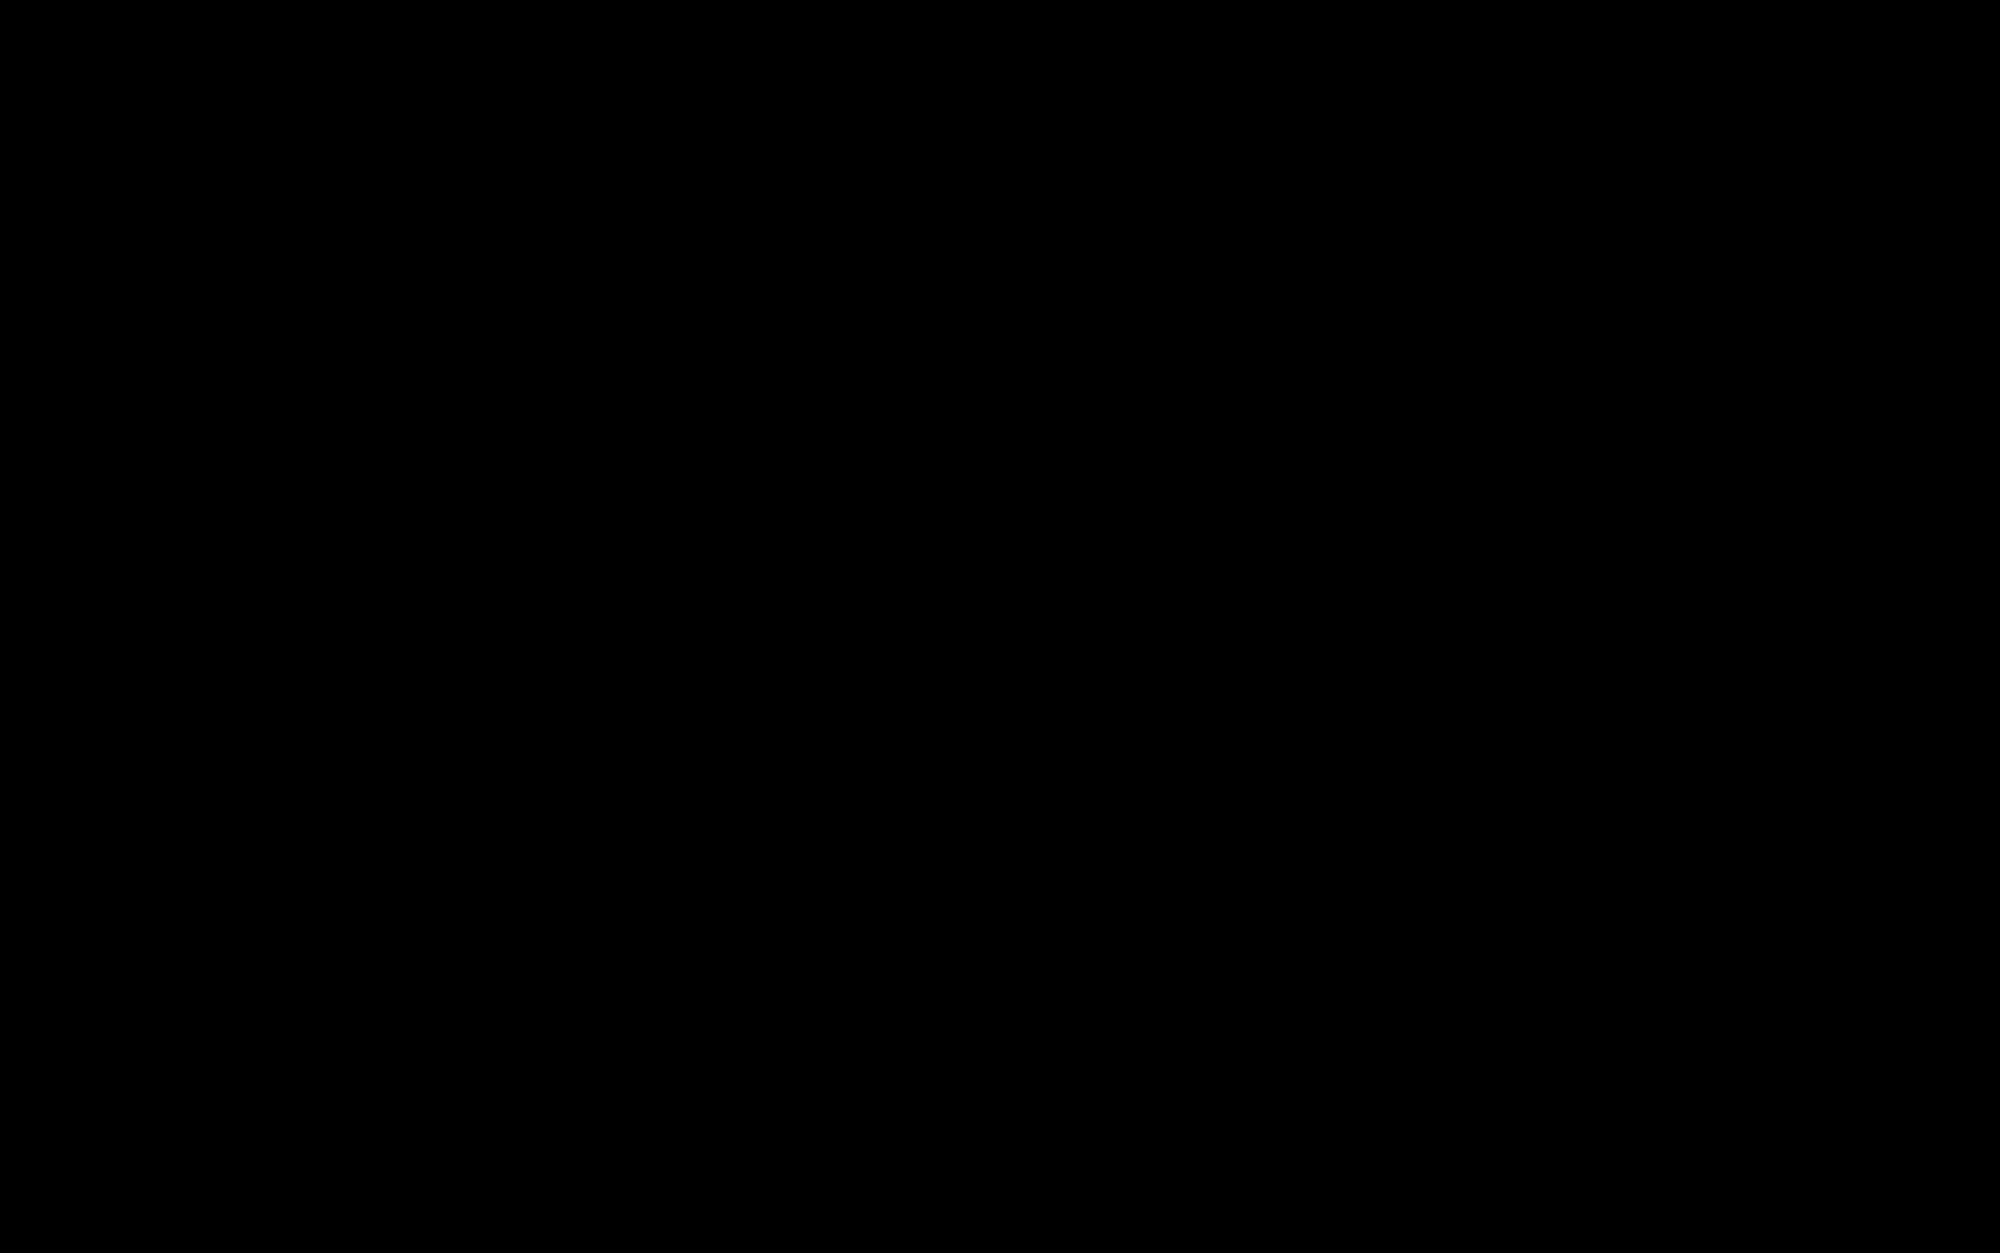 Разработка логотипа для управляющей компании фото f_7895f831203d4360.png